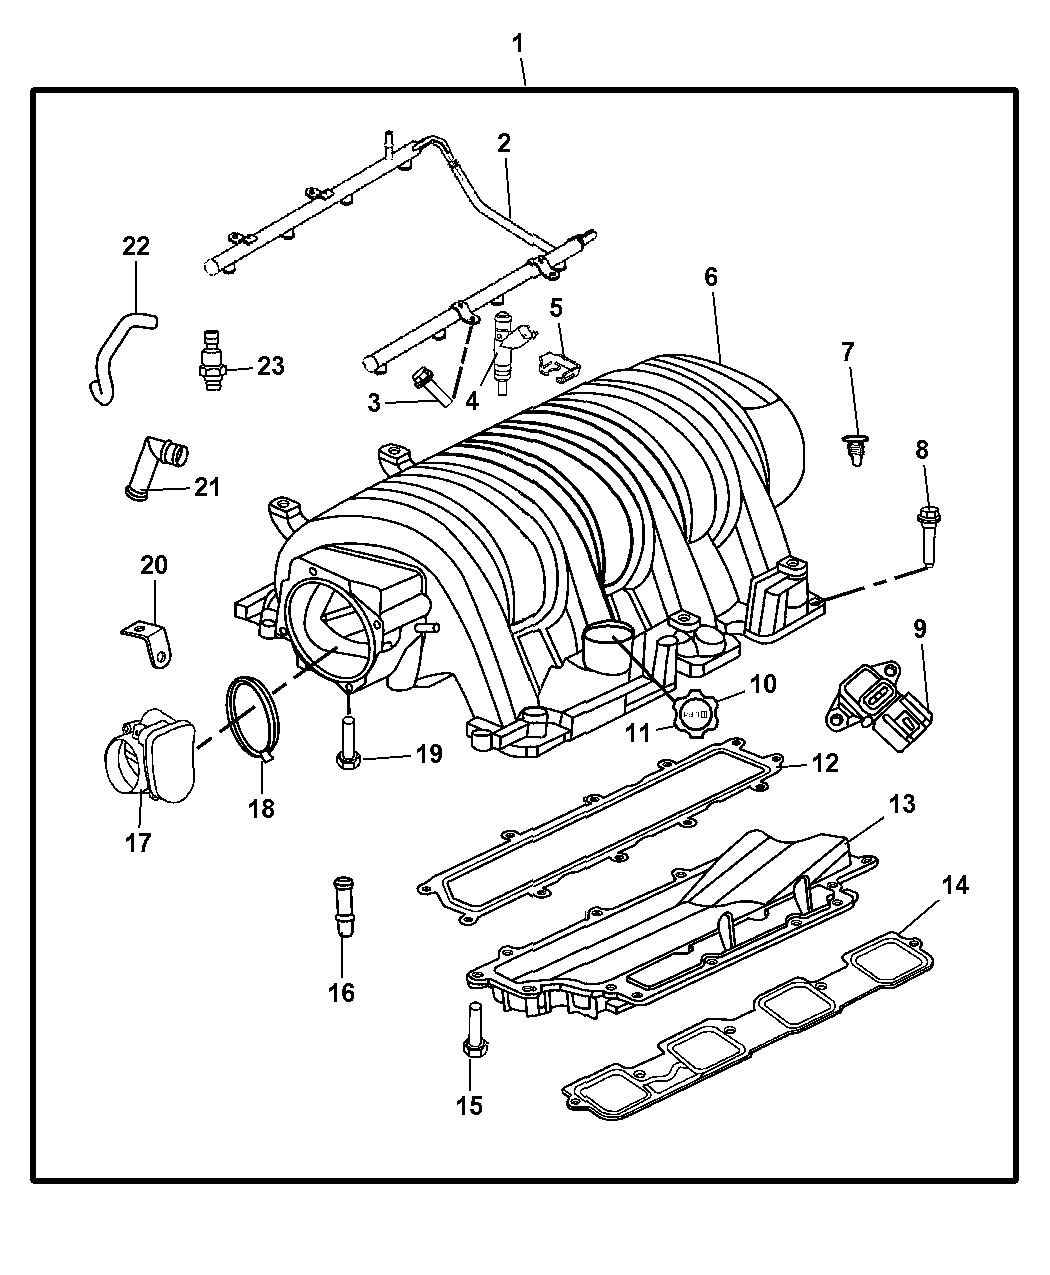 2007 Hyundai Tucson Car Stereo Radio Wiring Diagram Motobild